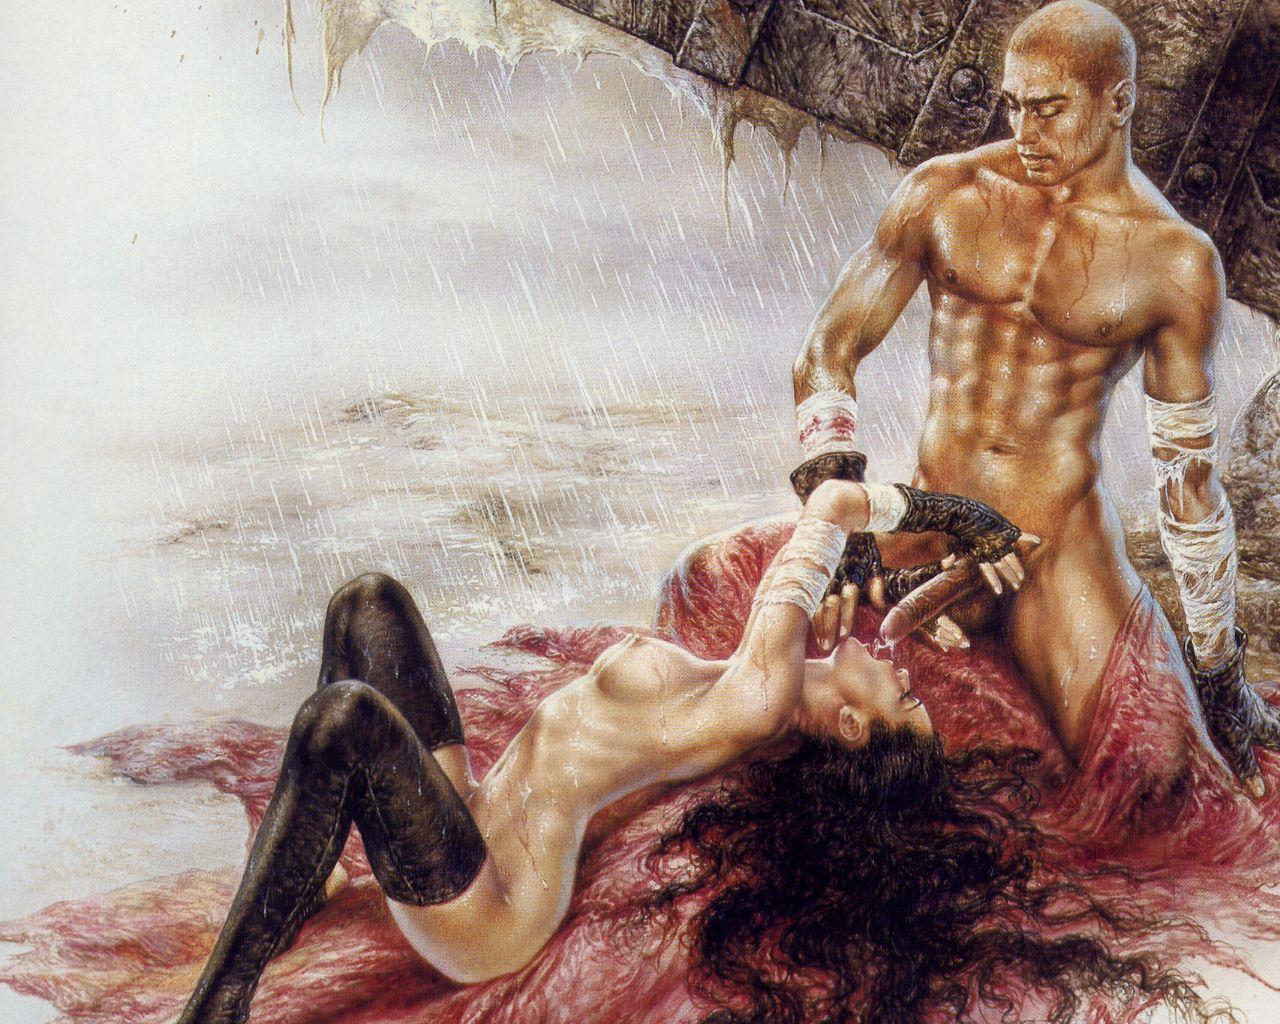 eroticheskie-risunki-fentezi